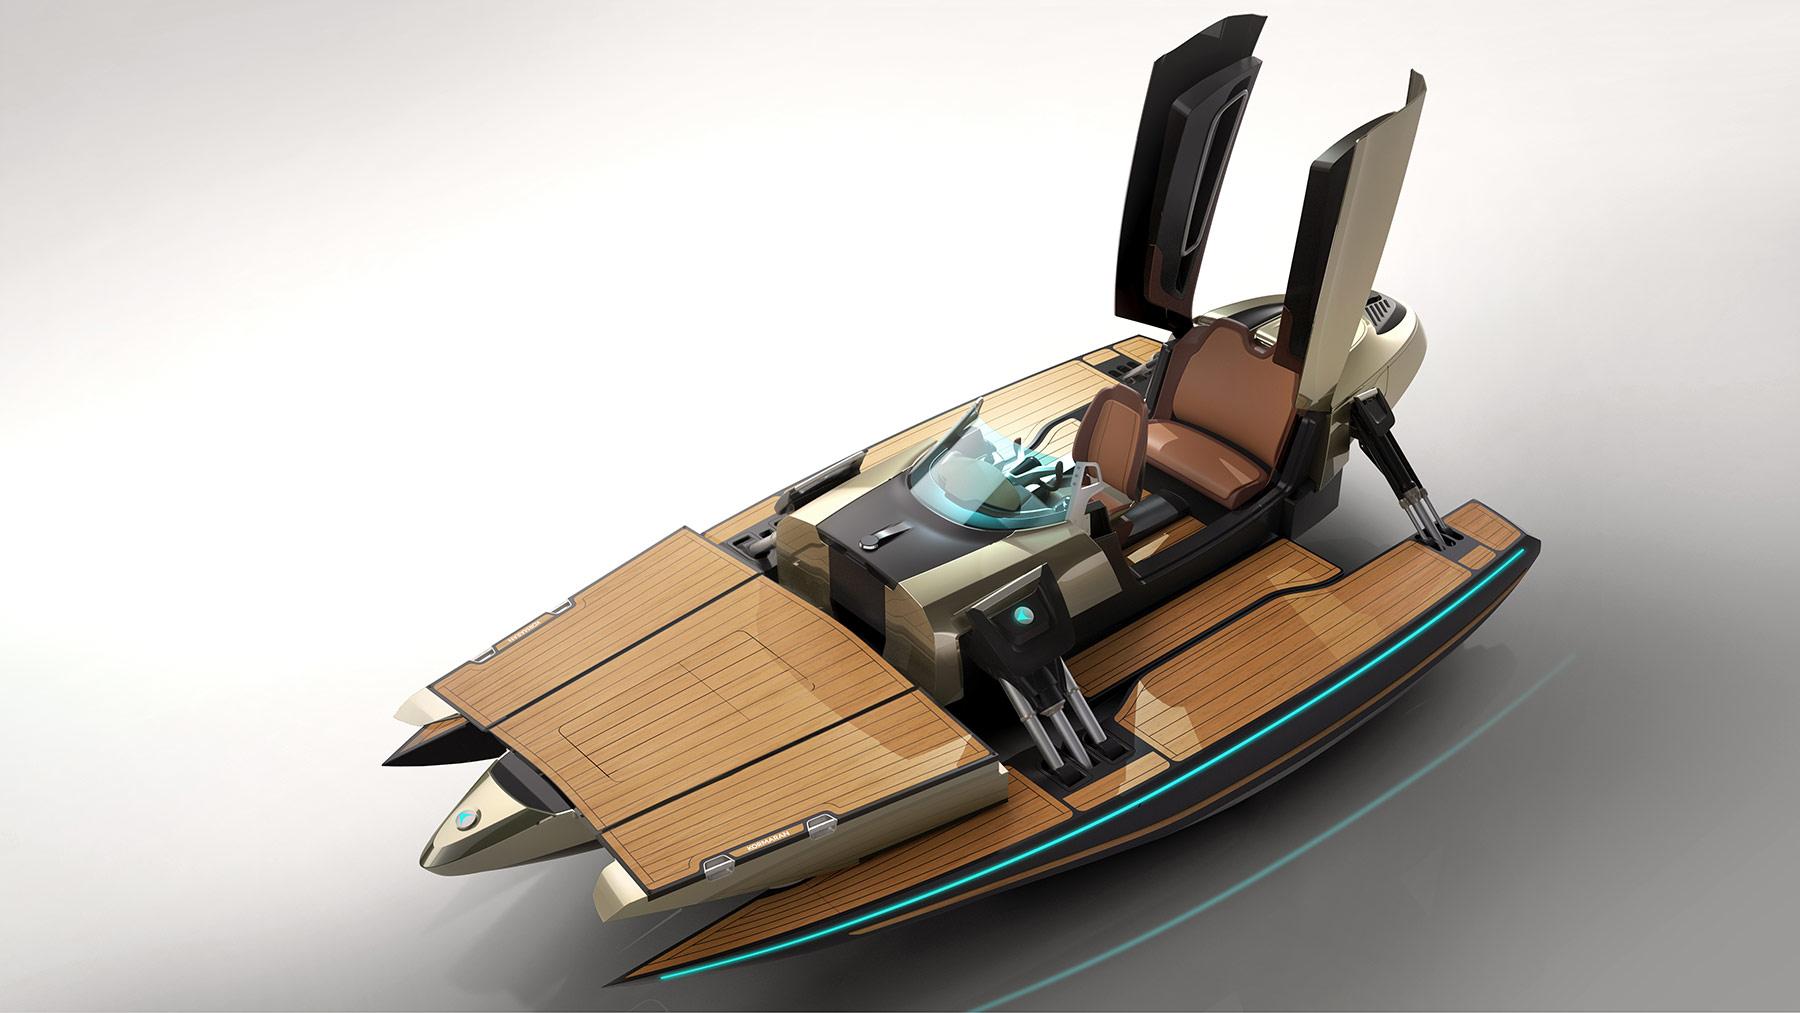 kormoran-k7-luxusni-clun